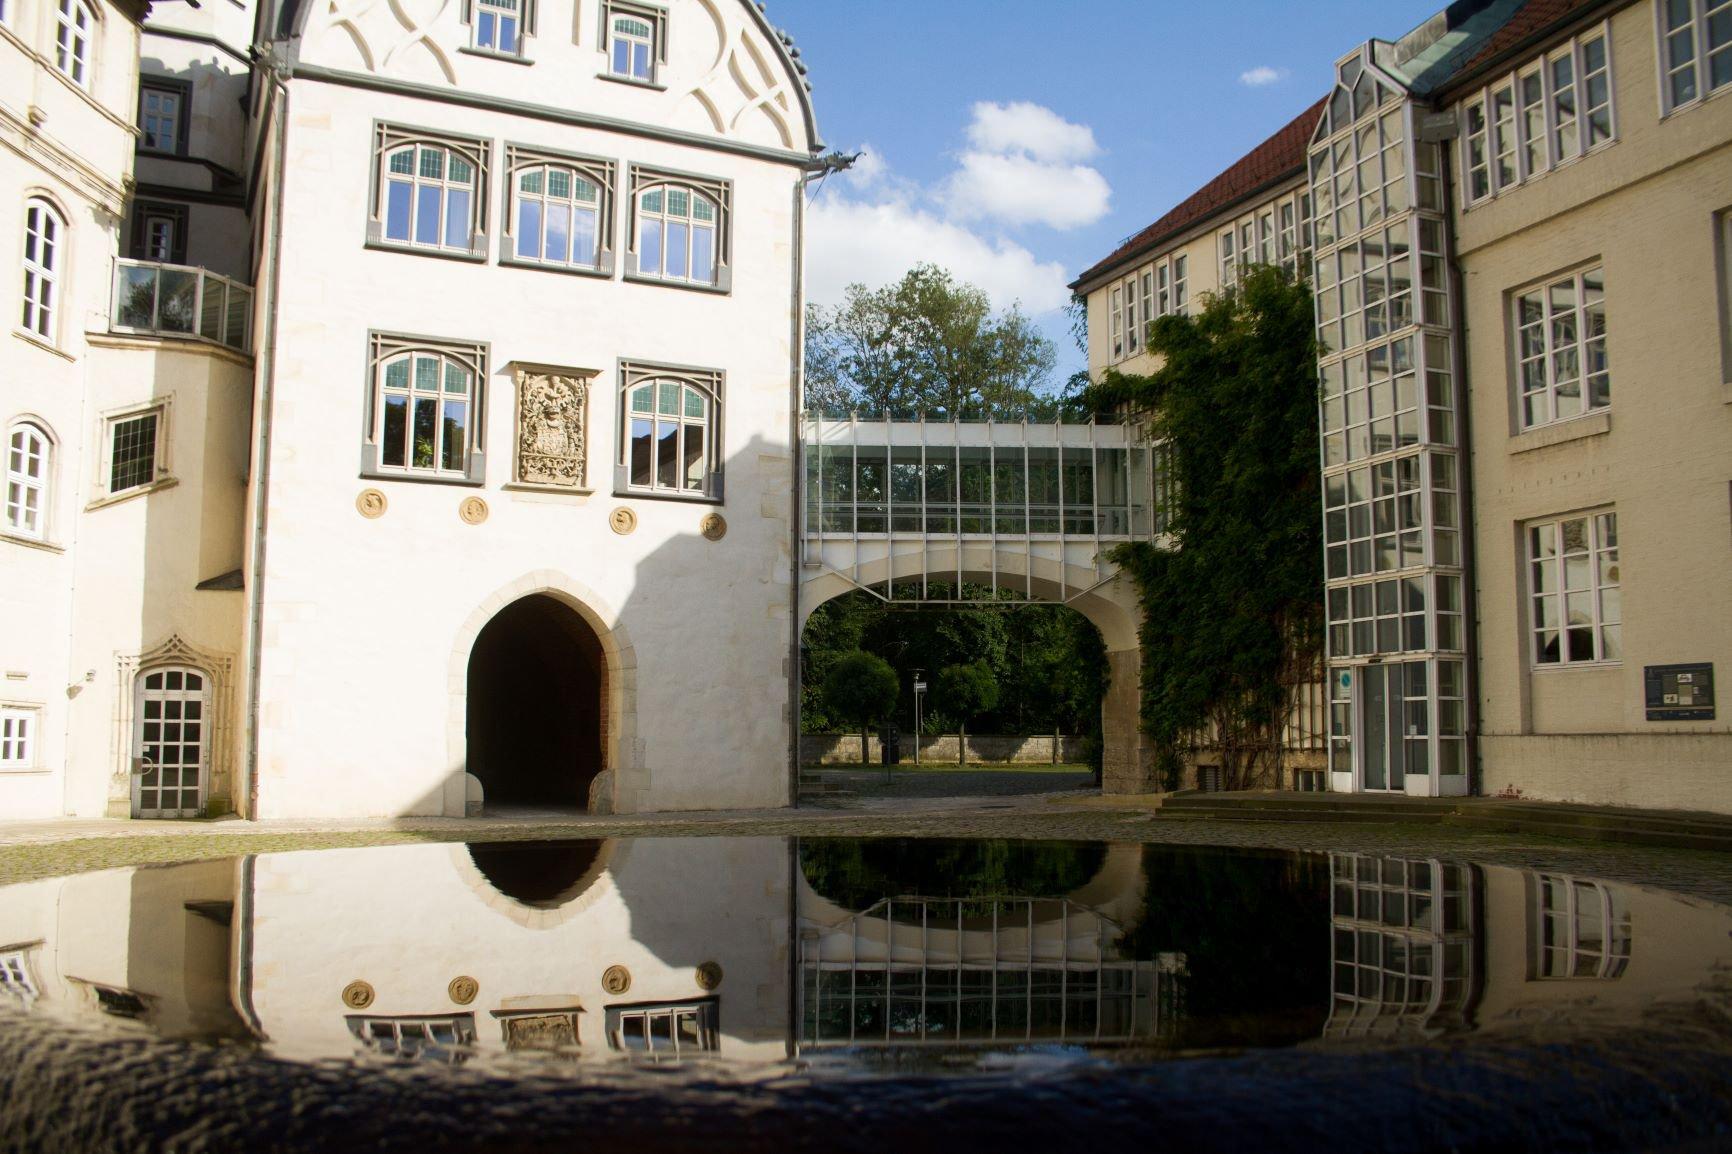 Schloss und Umgebung 07-2017-19 Fotografin Elena Klann